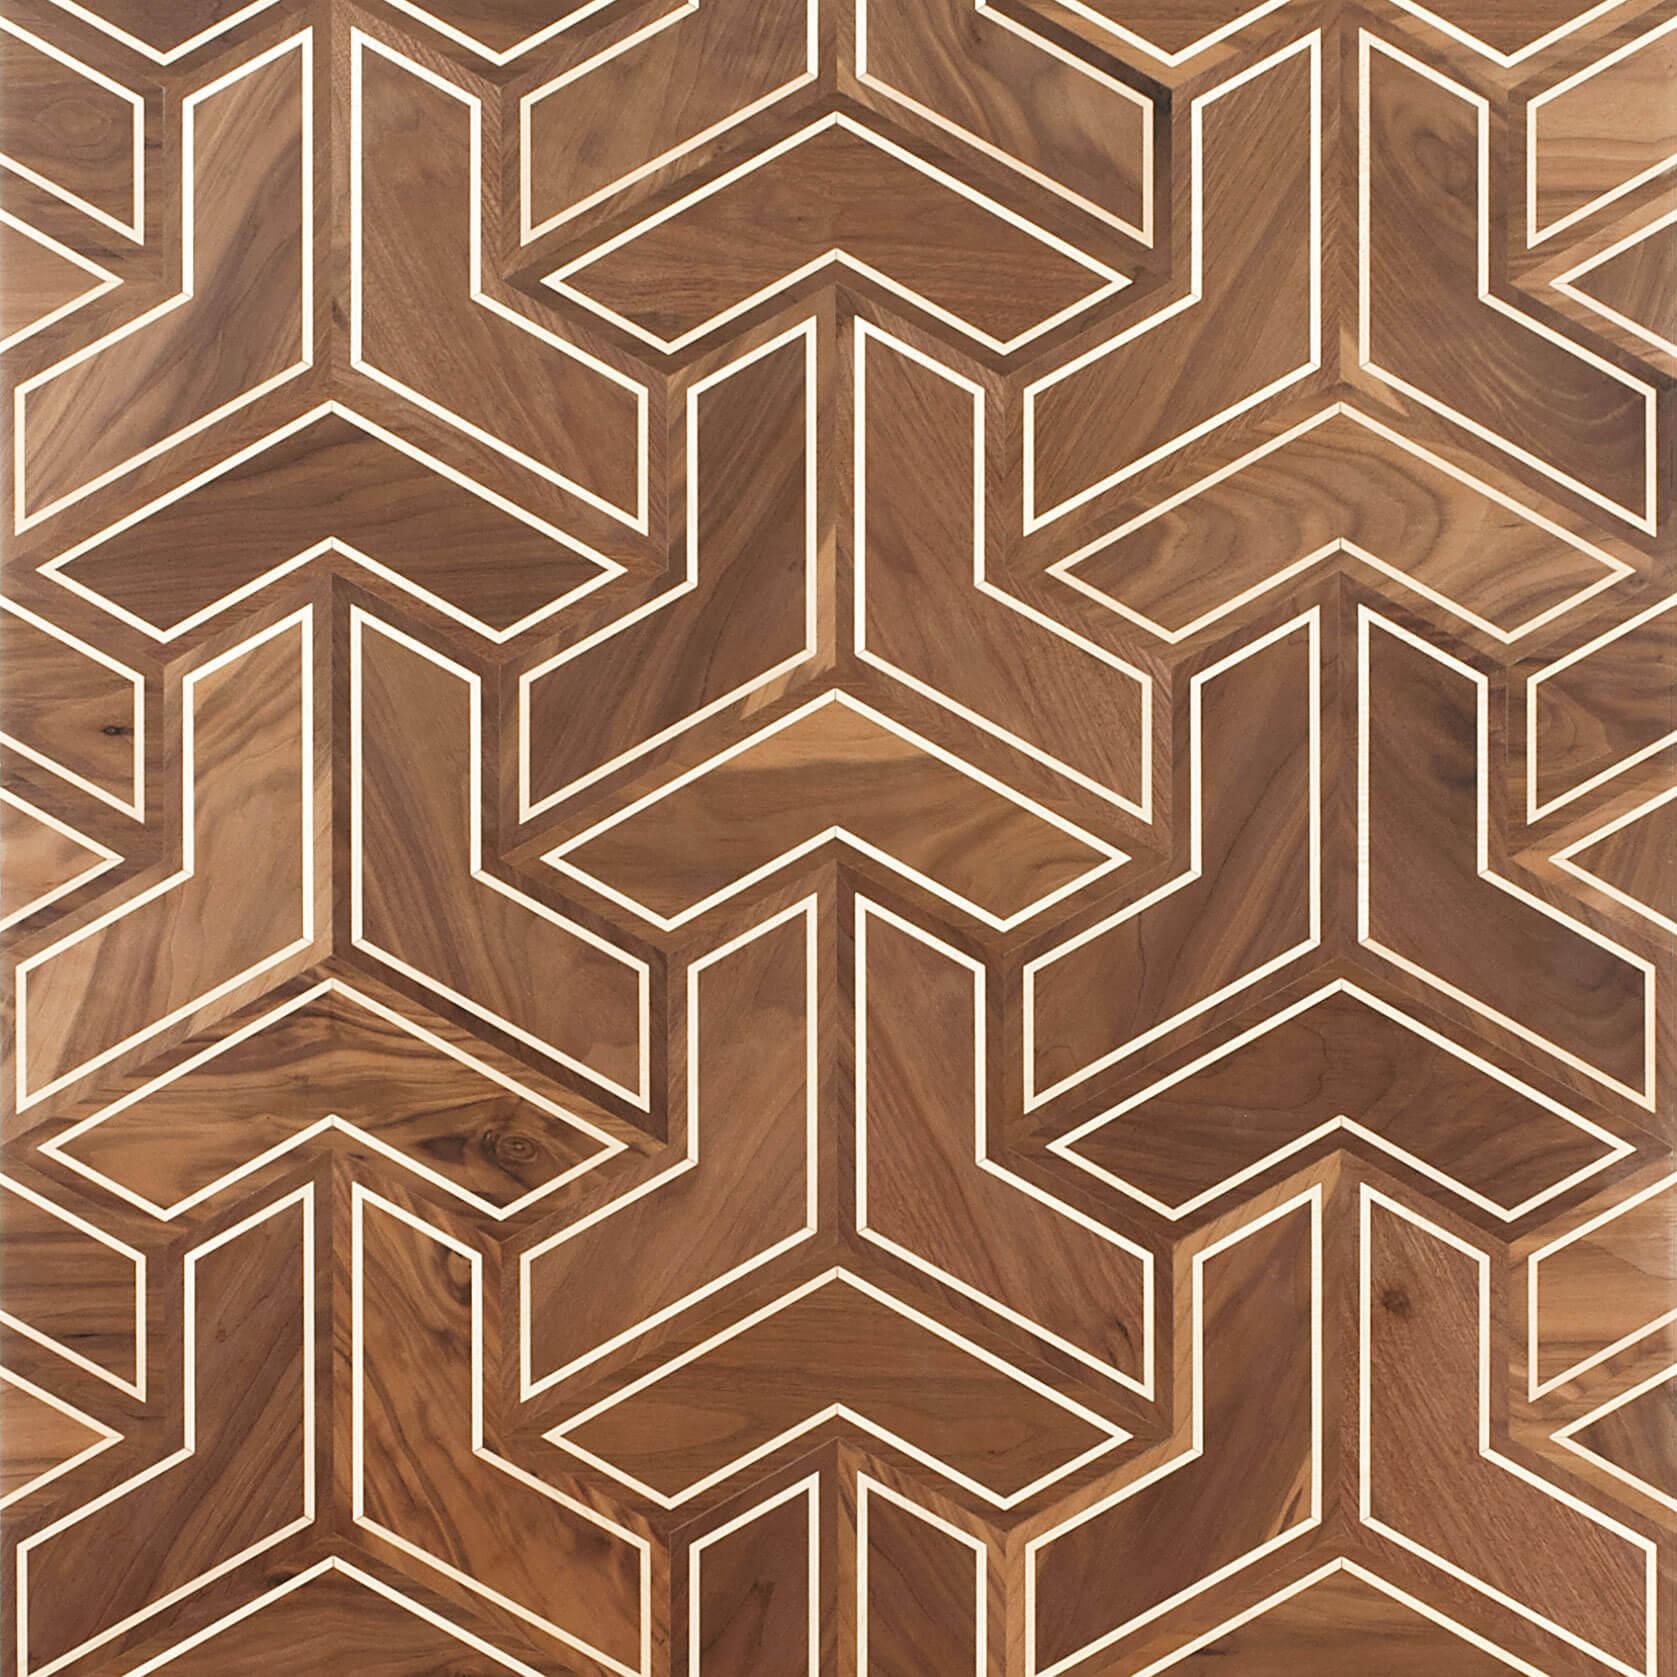 Element7-Bespoke-Floors-Poliedro